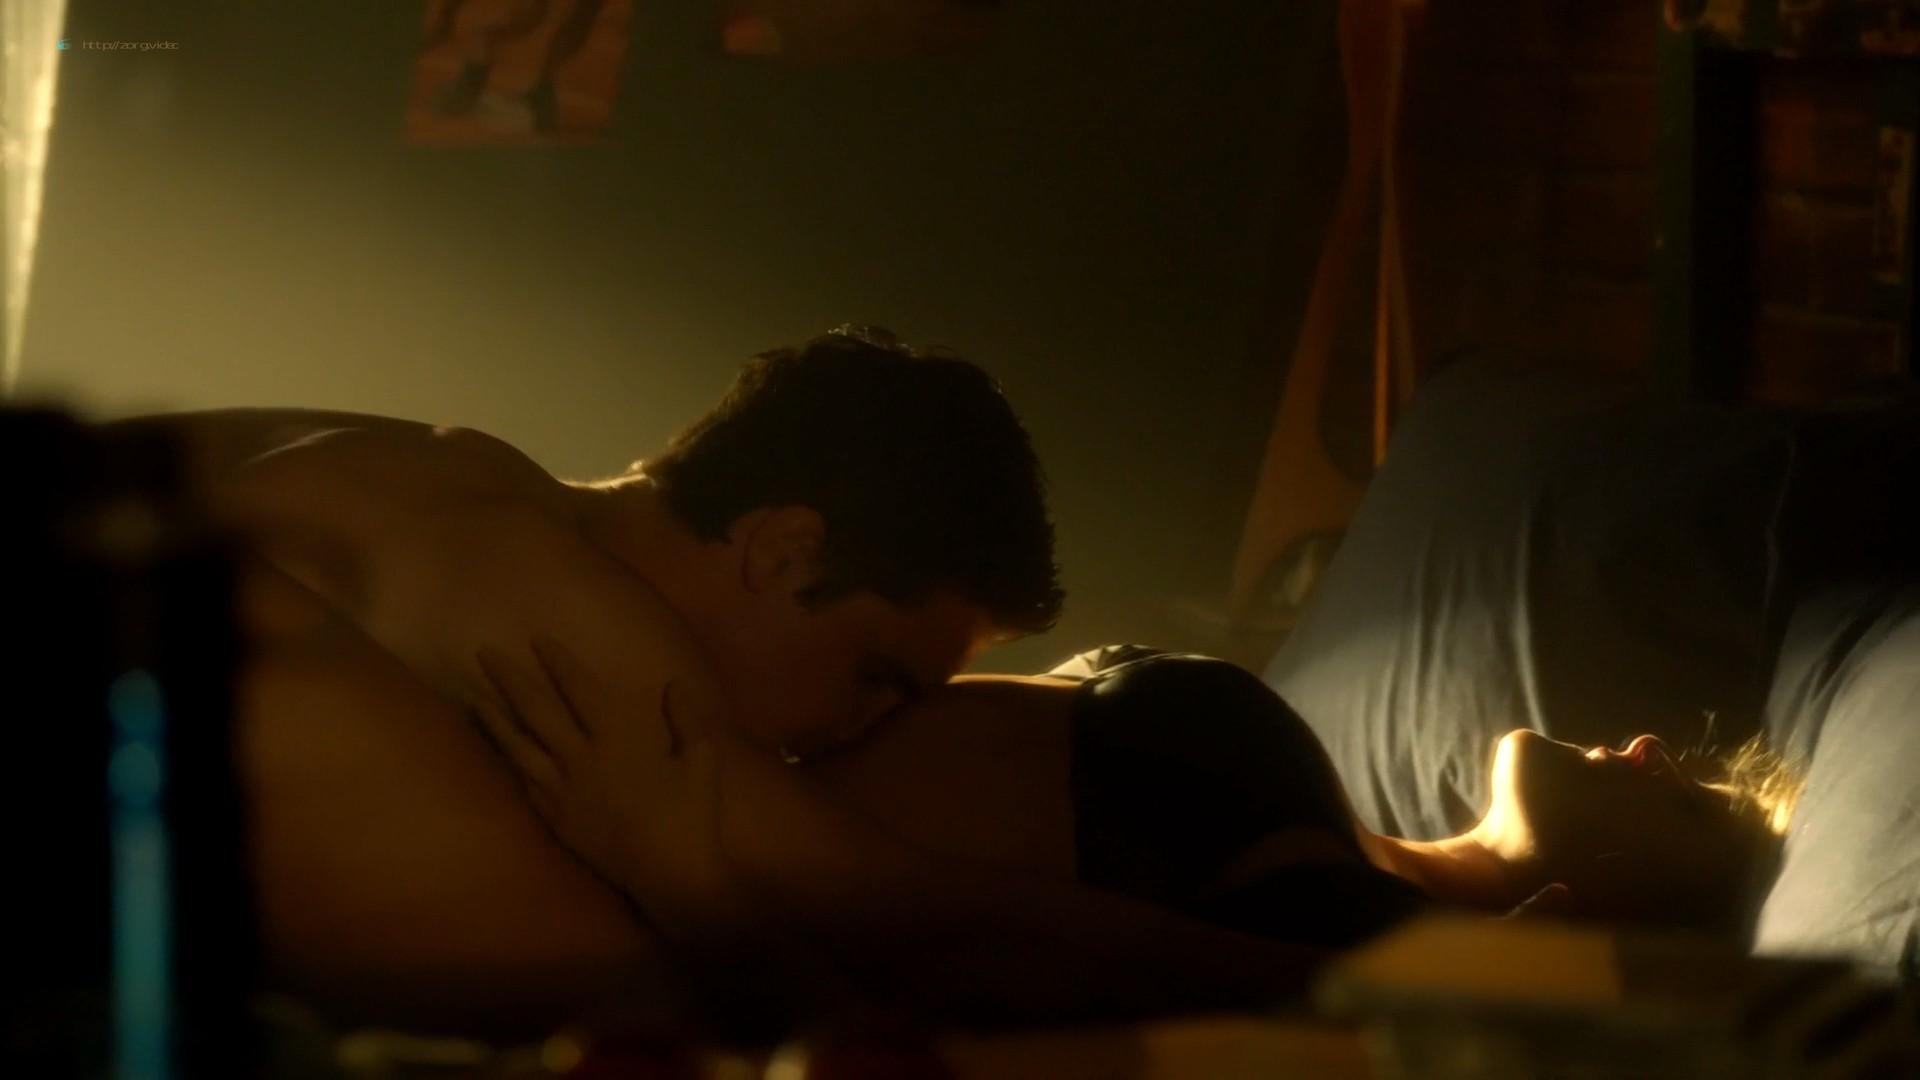 Alexa Vega hot and some sex - The Tomorrow People (2014) s1e18-19 HD (8)